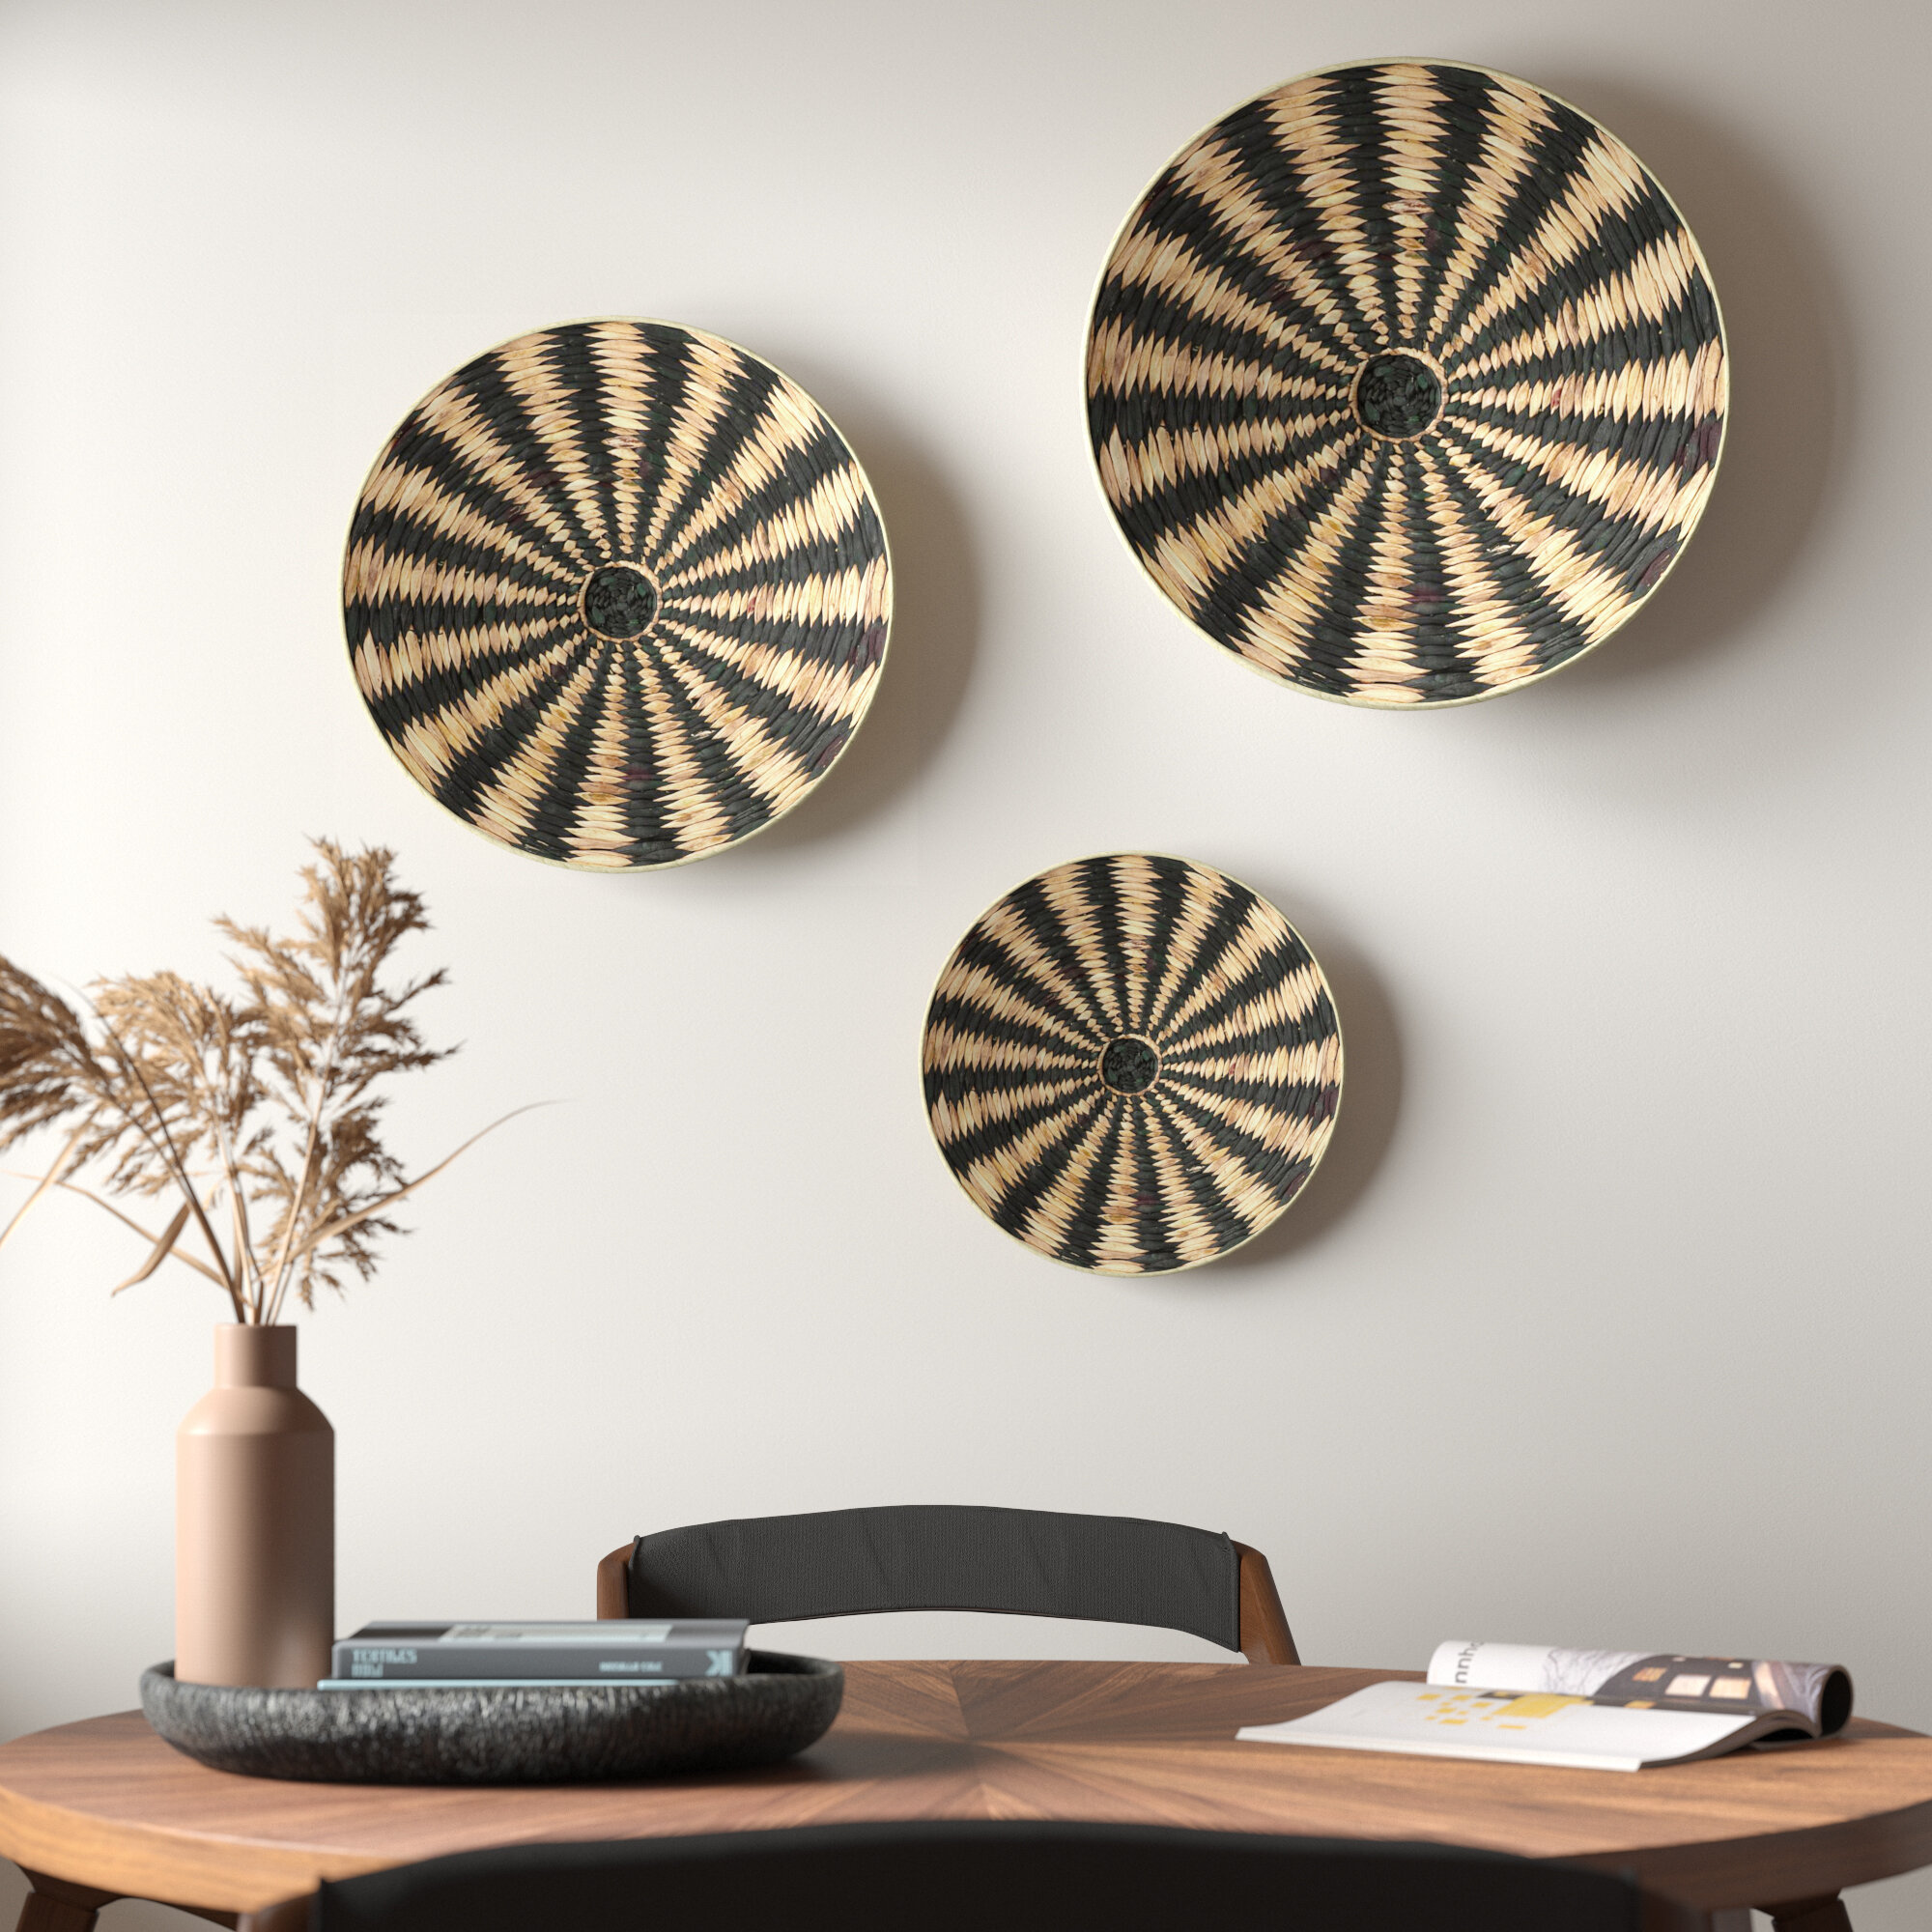 3 Piece Striped Circular Rattan Tray